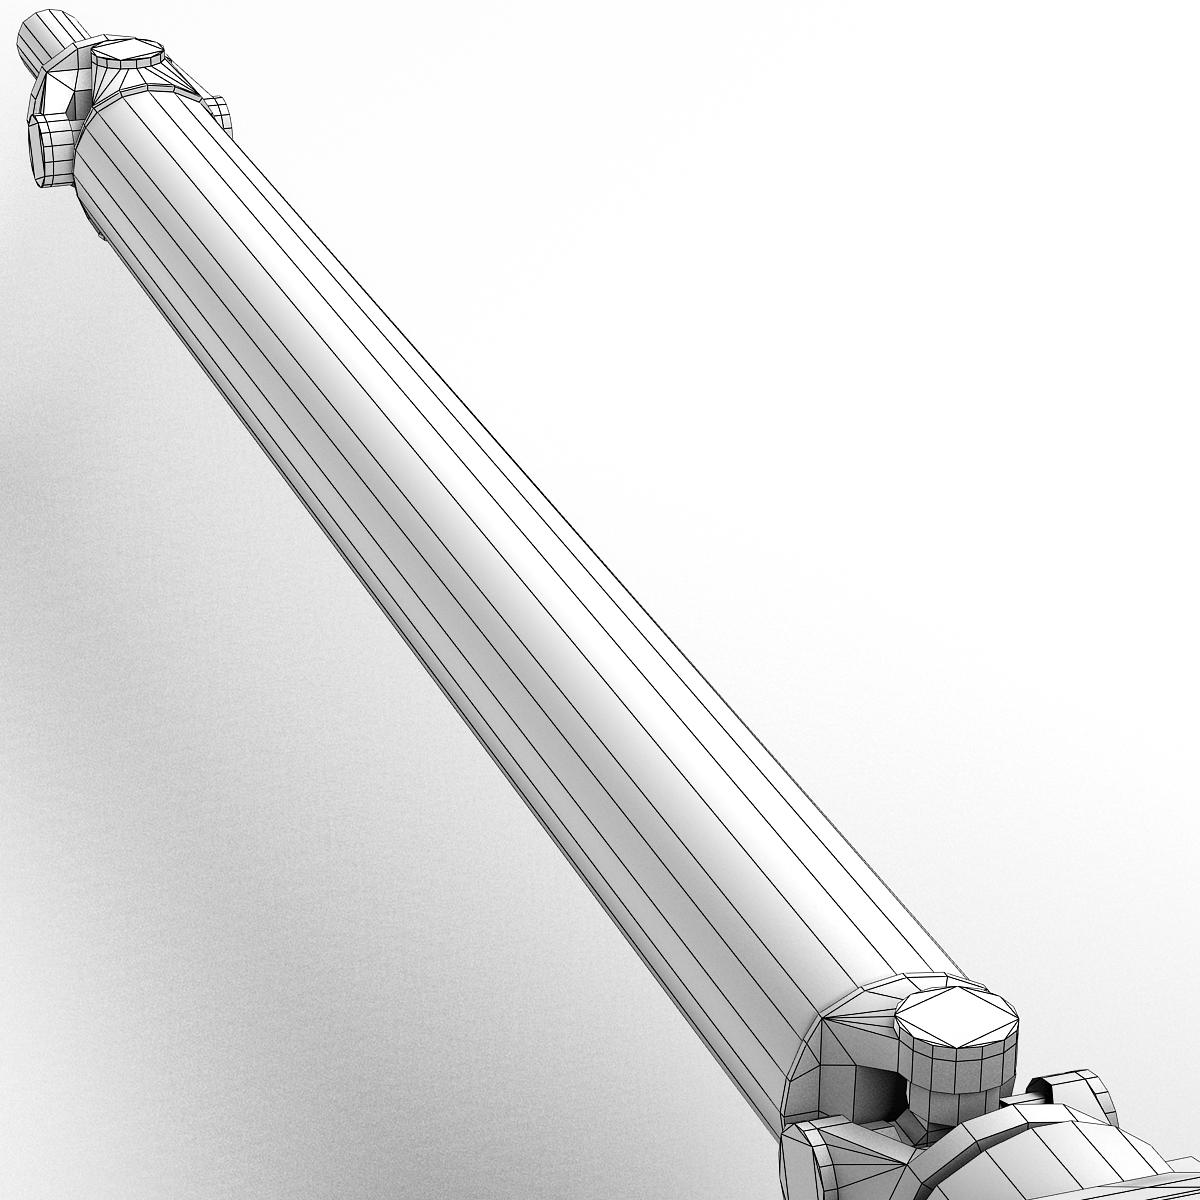 axle and driveshaft 3d model 3ds max fbx tga targa icb vda vst pix obj 224443